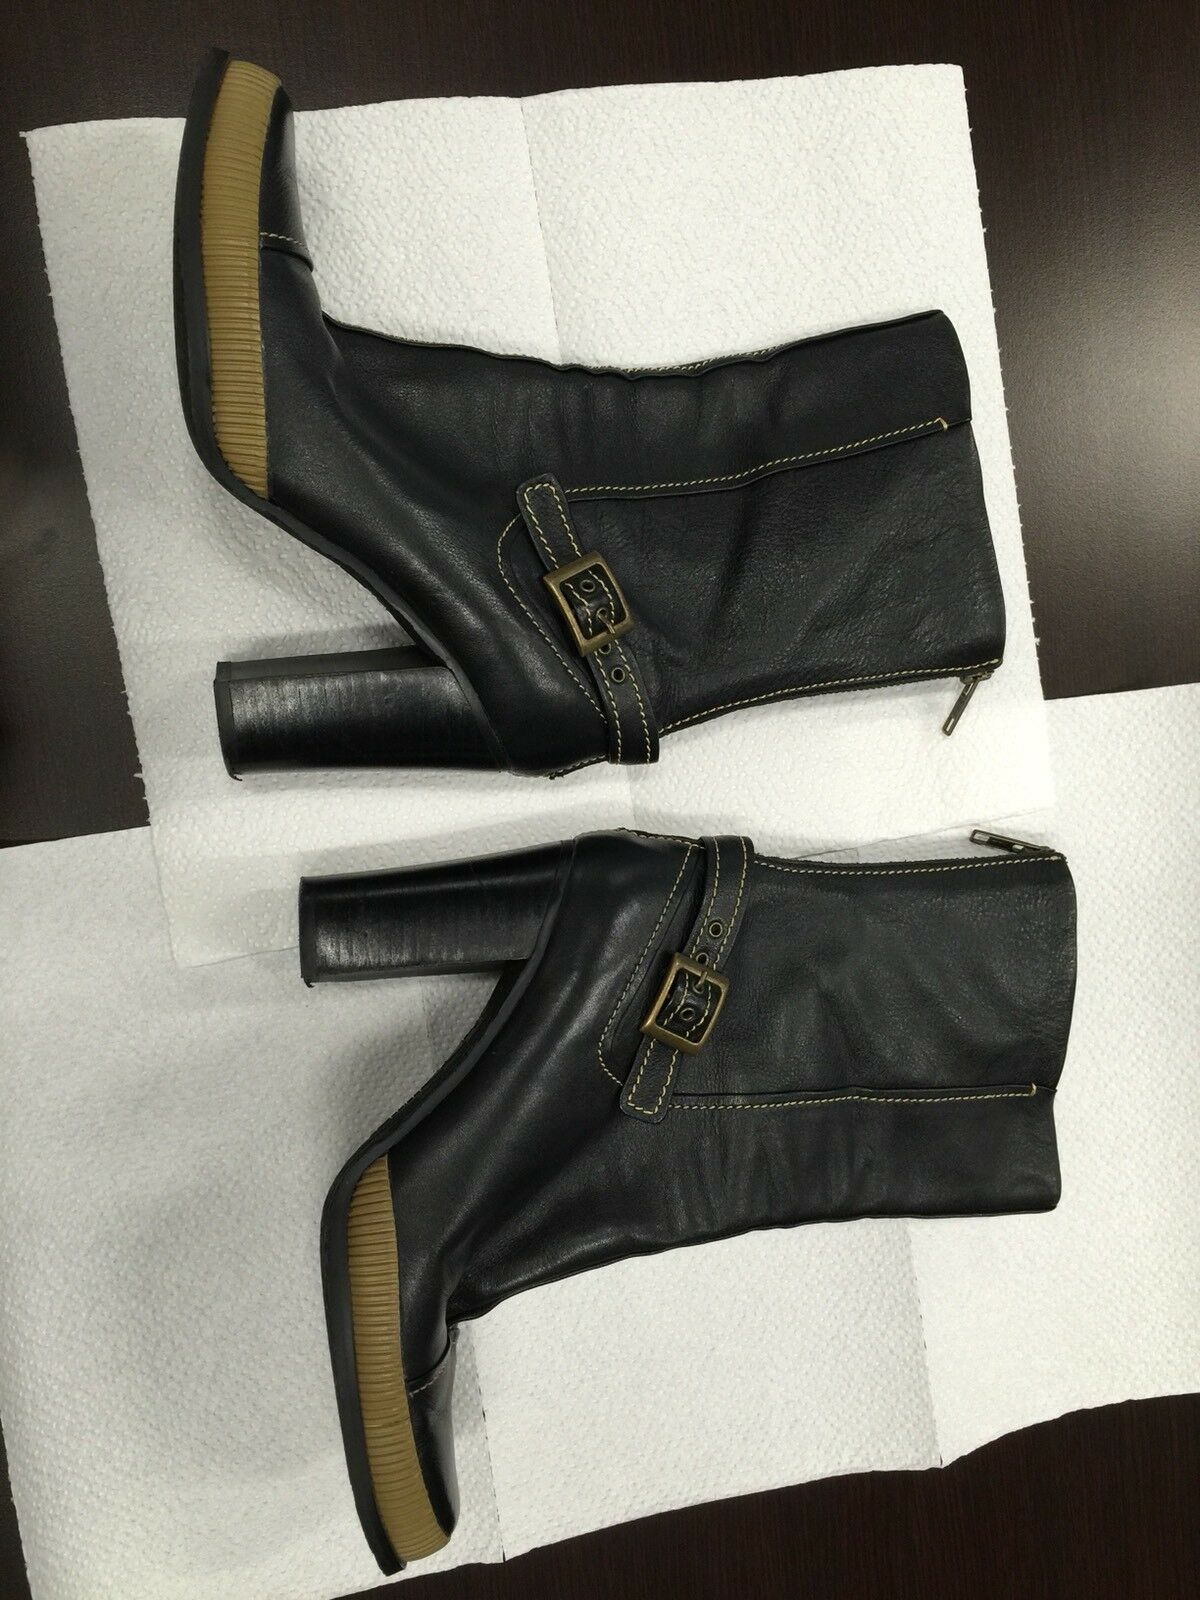 Ladies Daniblack Boots Size 7-1/2 M Black With Brown Accents Zipper Ankle